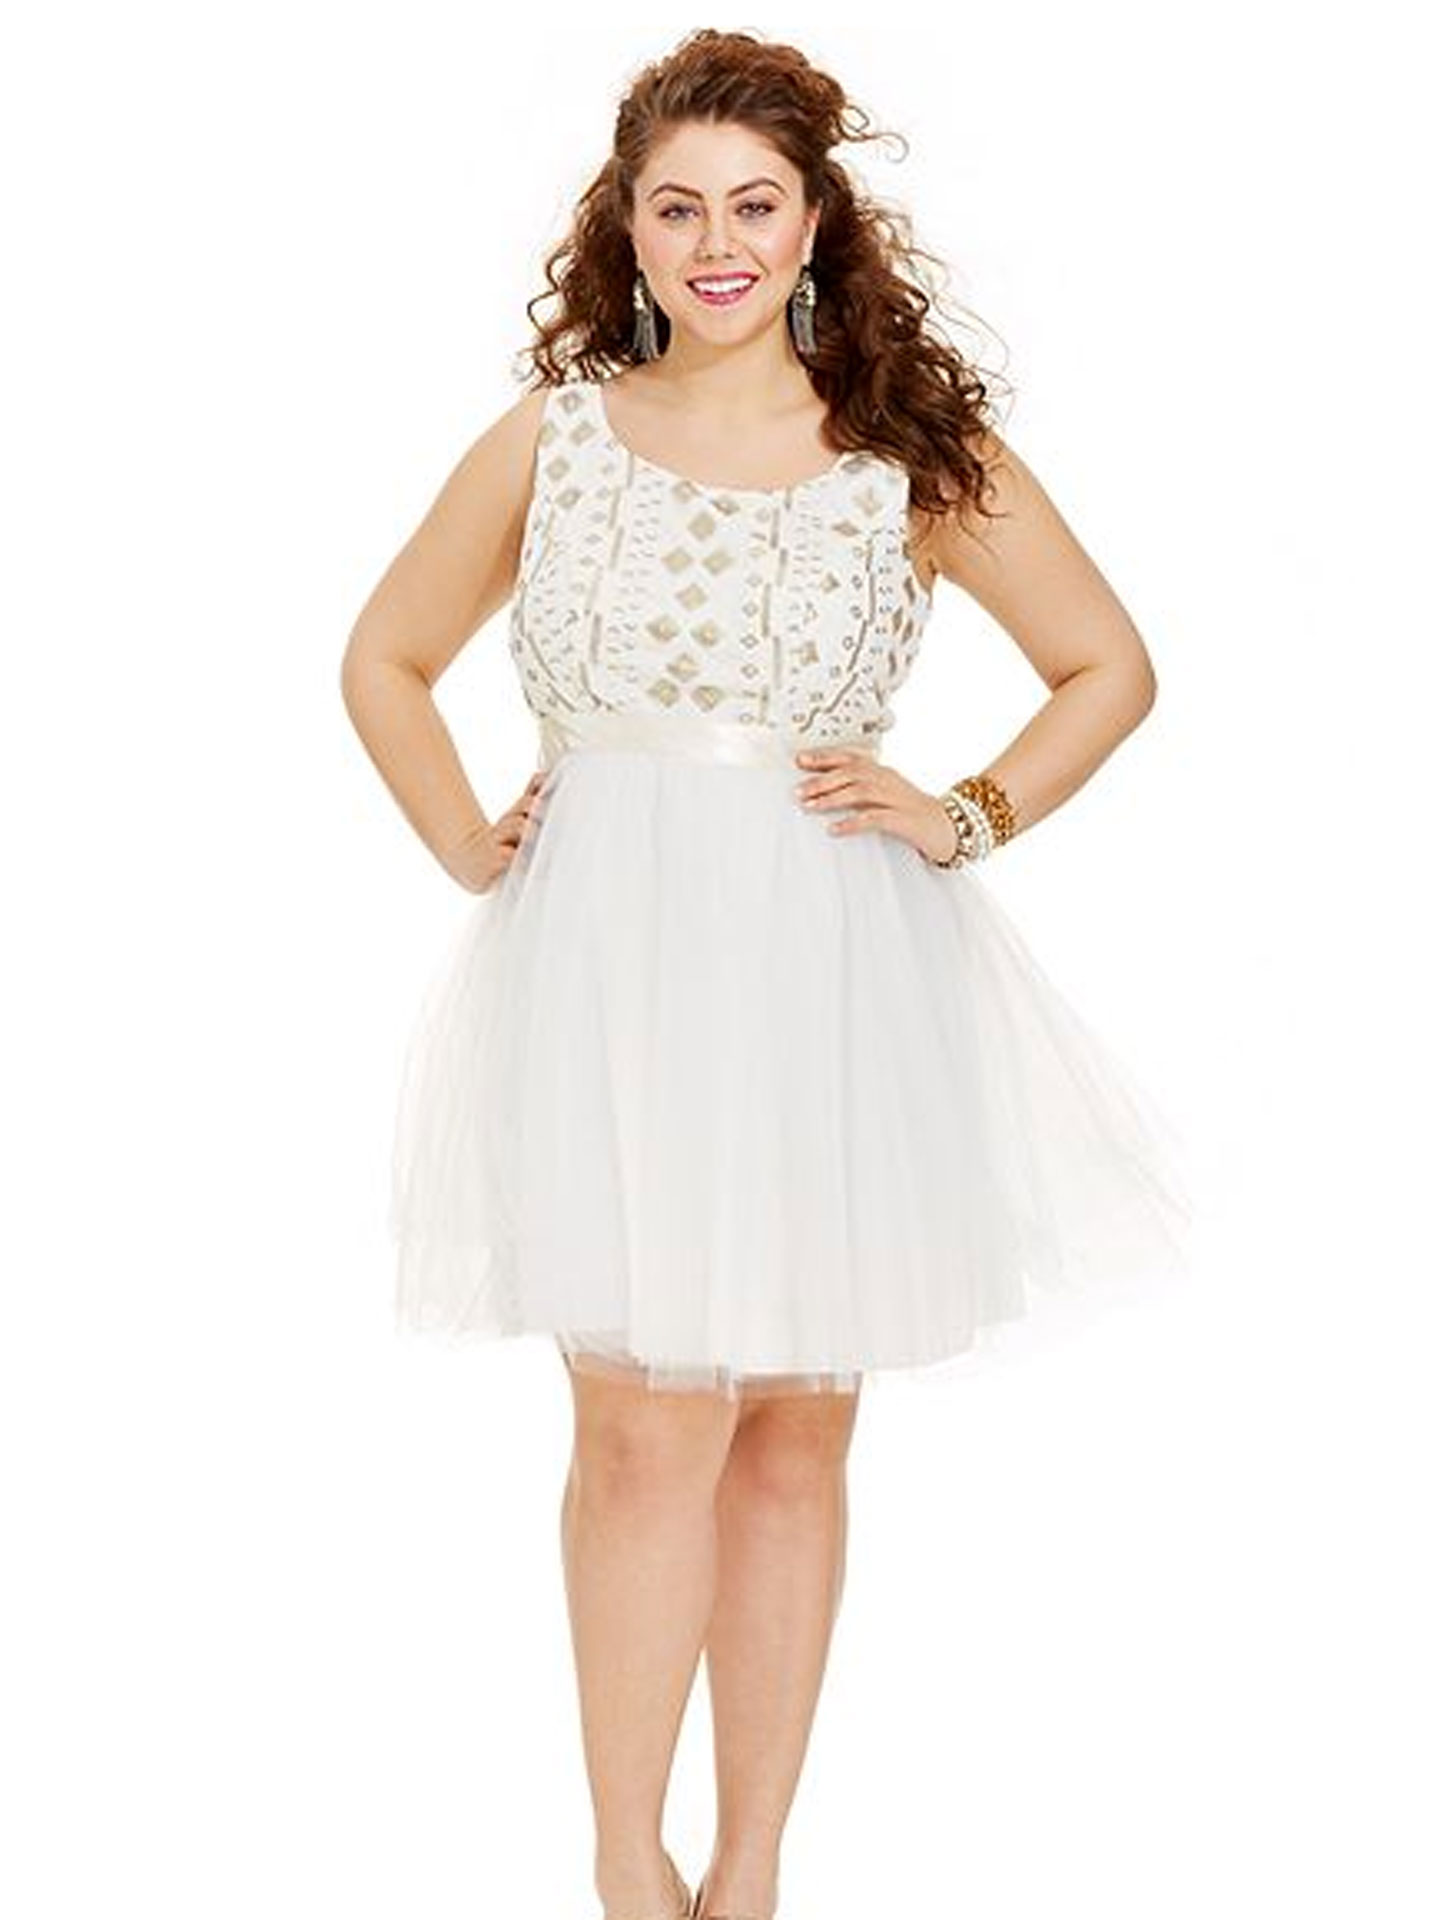 Macy'S Plus Size Prom Dresses 2016 - Prom Dresses Cheap